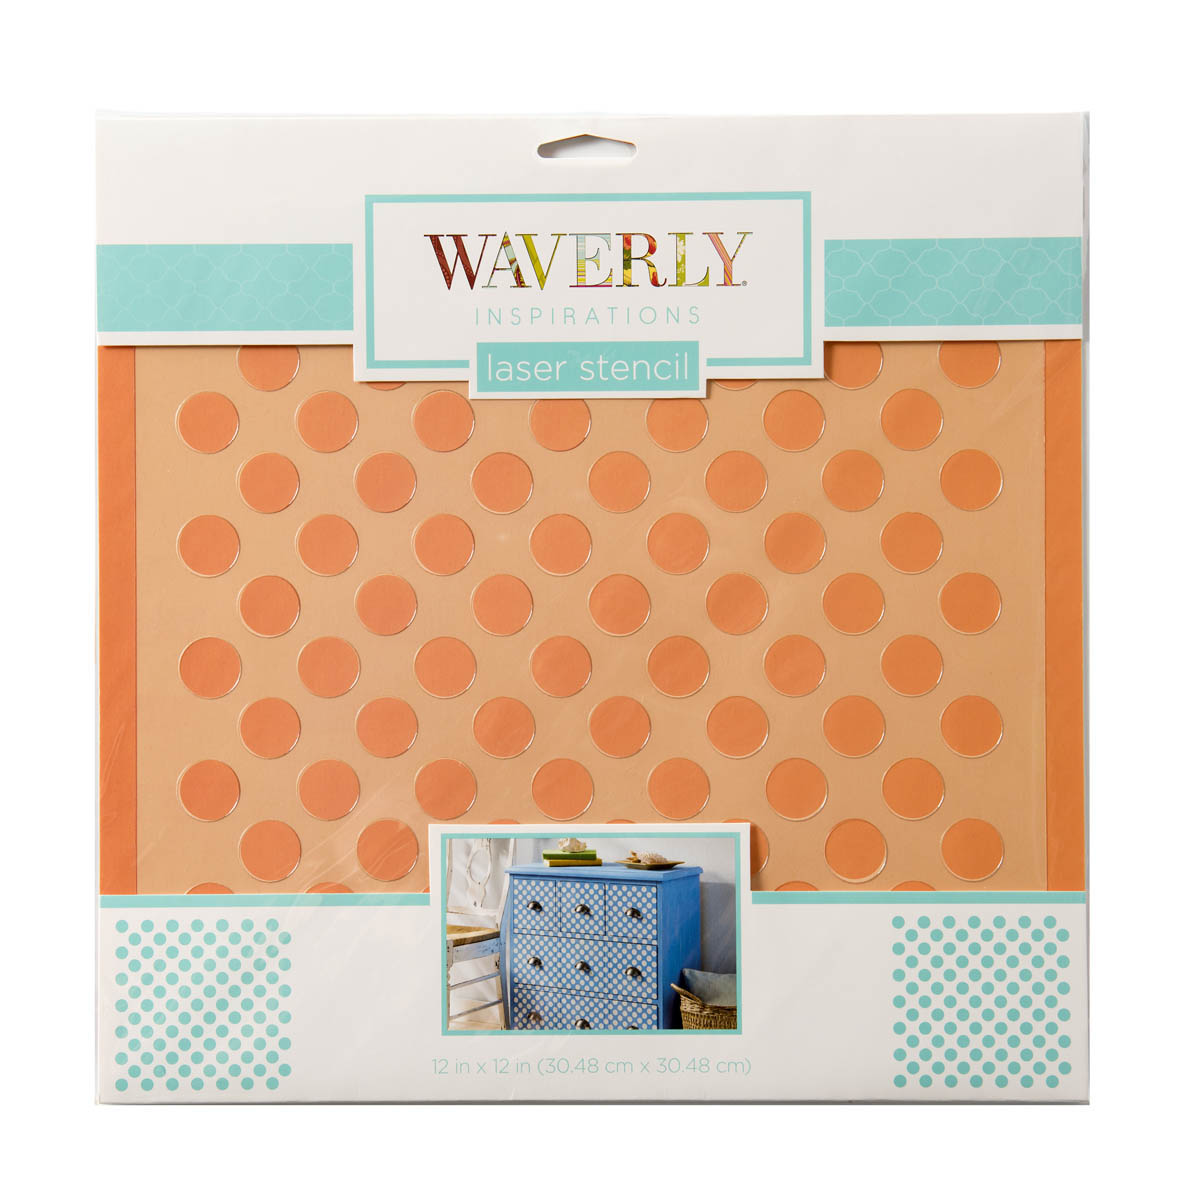 Waverly ® Inspirations Laser Stencils - Décor - Big Dot, 12